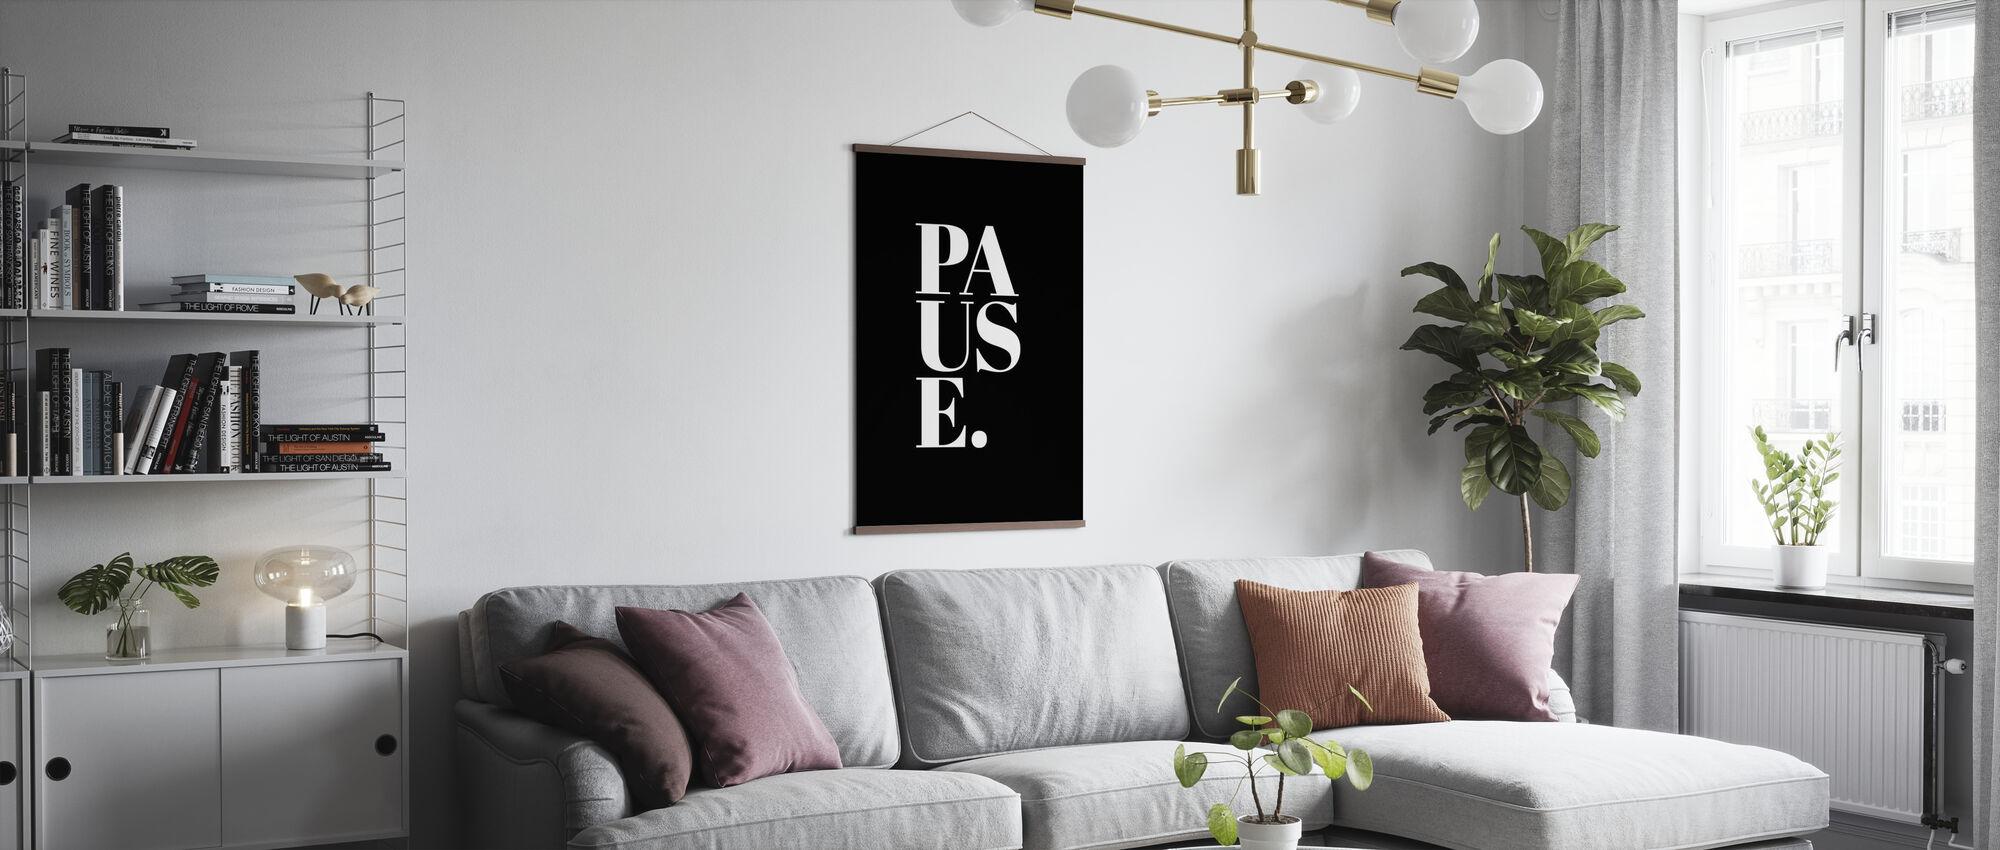 Pauze II - Poster - Woonkamer